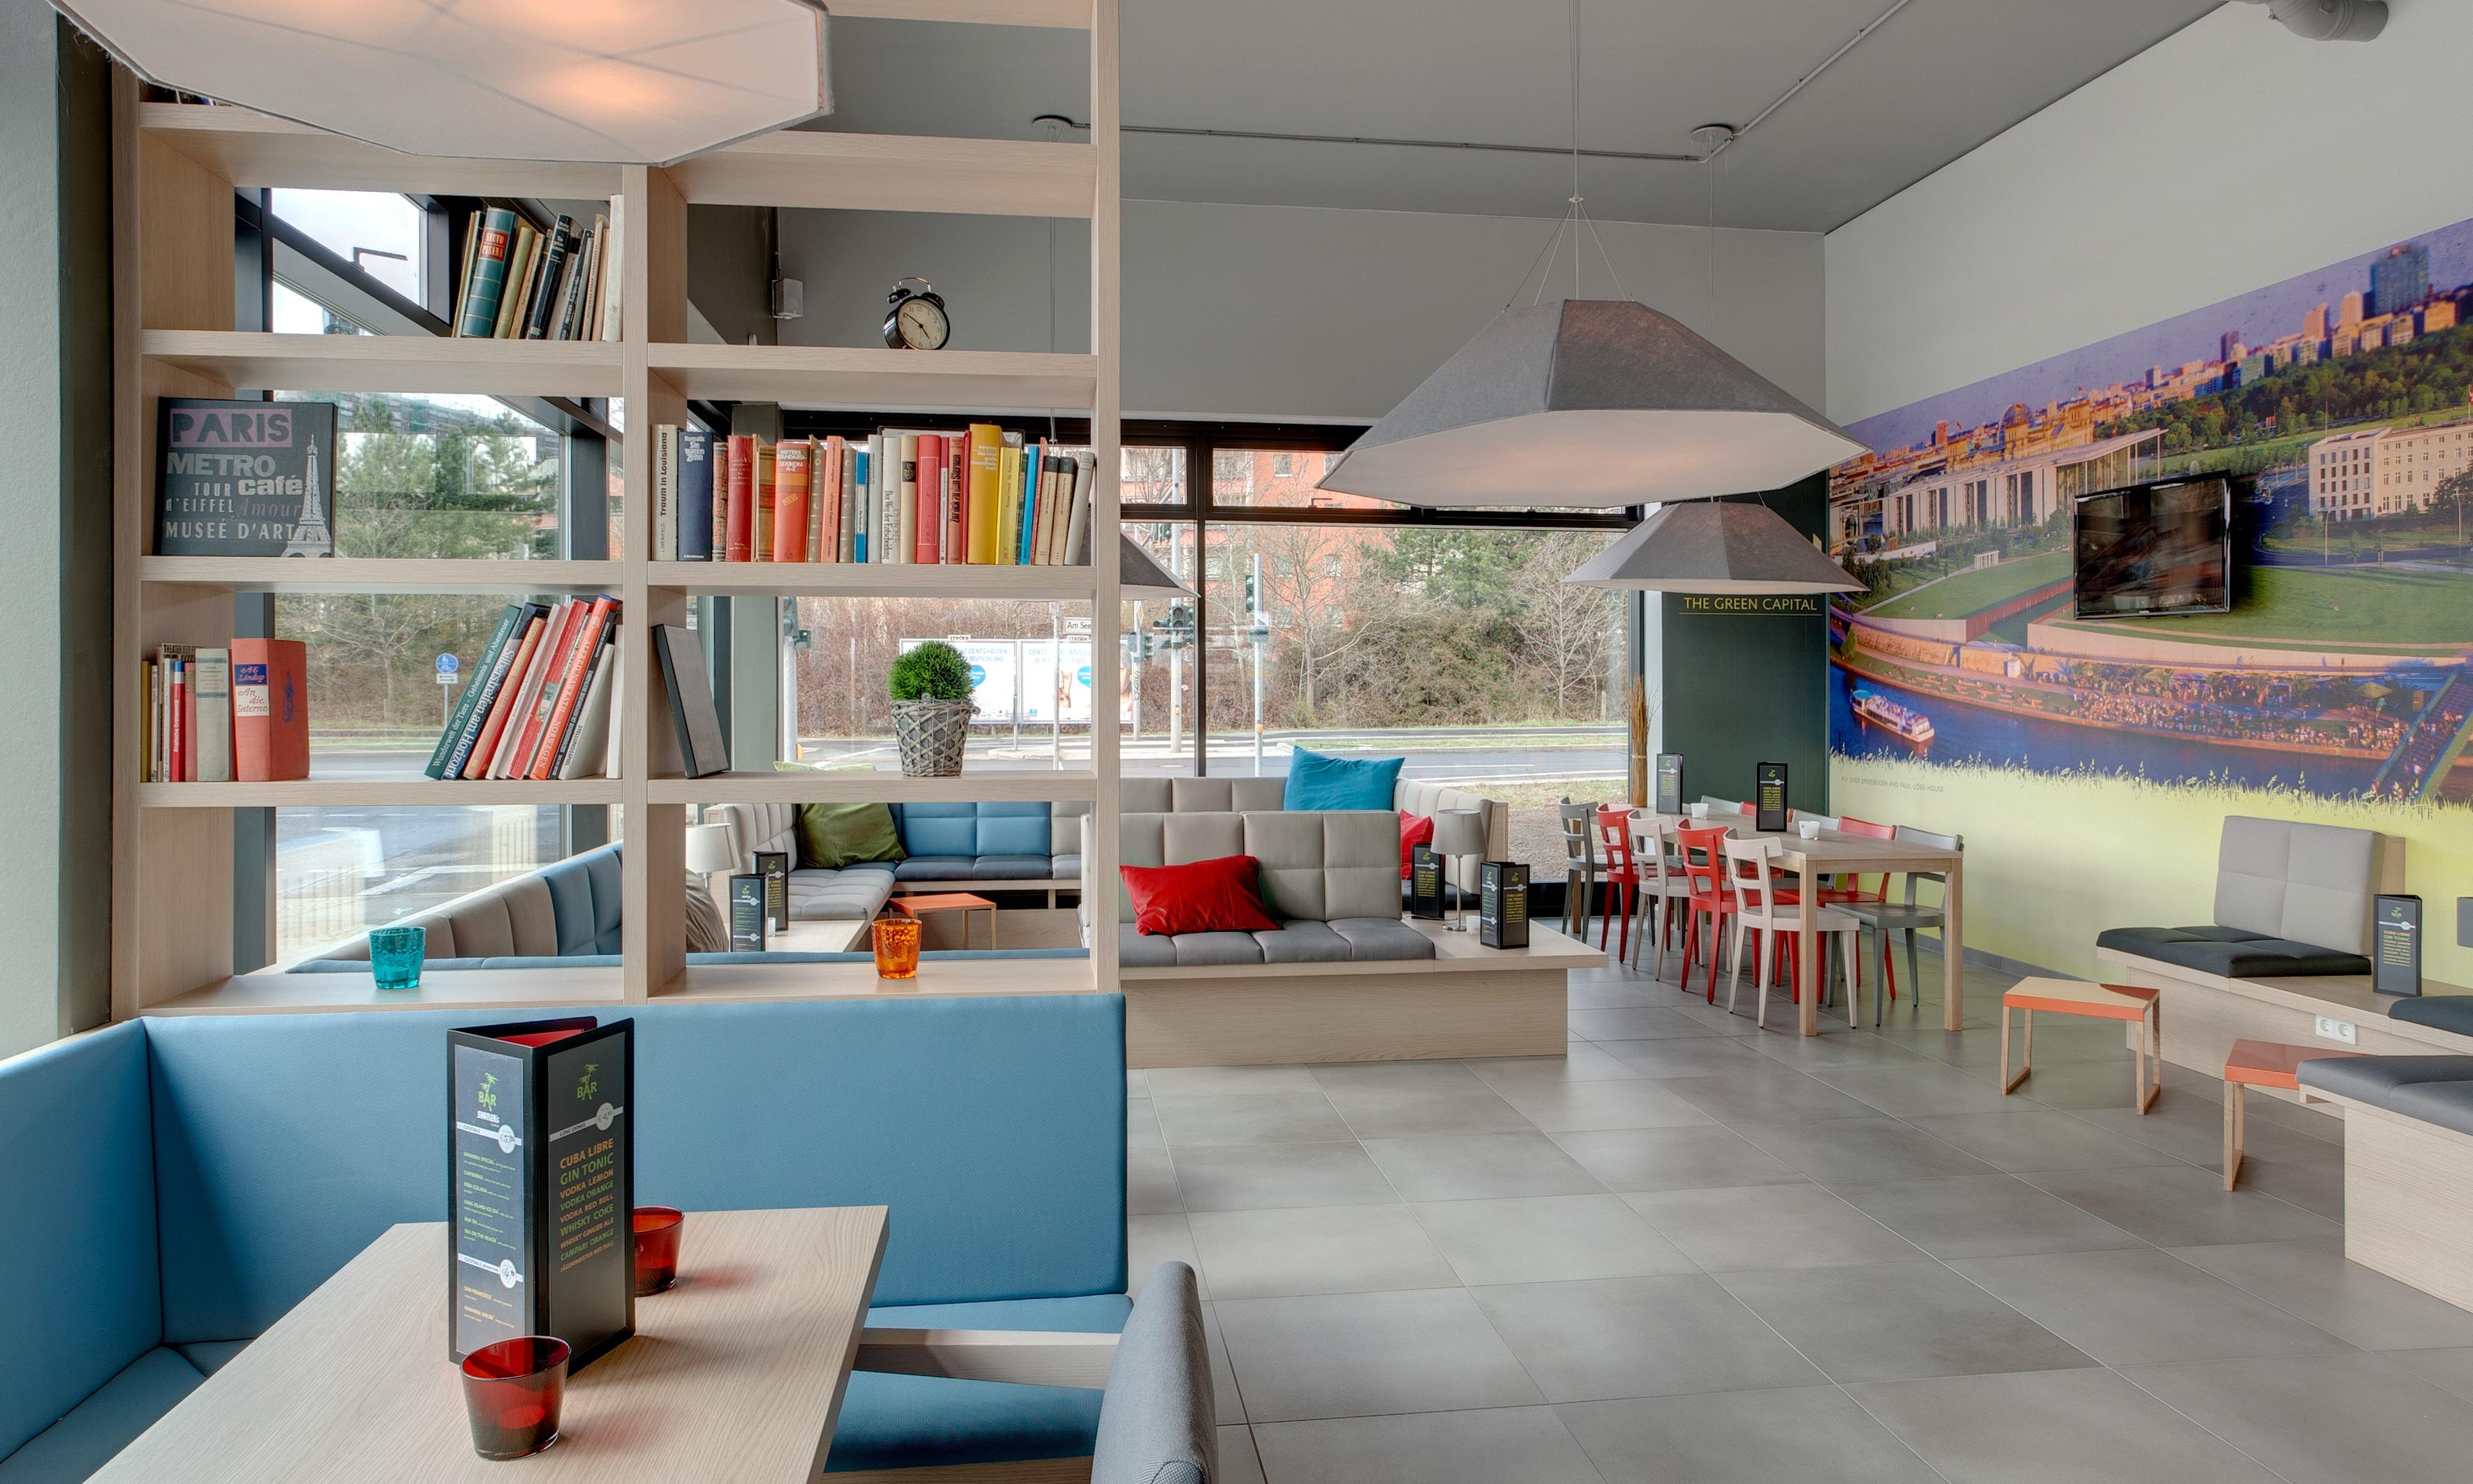 meininger hotels in berlin 4 x im zentrum sowie 1 x am sfx. Black Bedroom Furniture Sets. Home Design Ideas